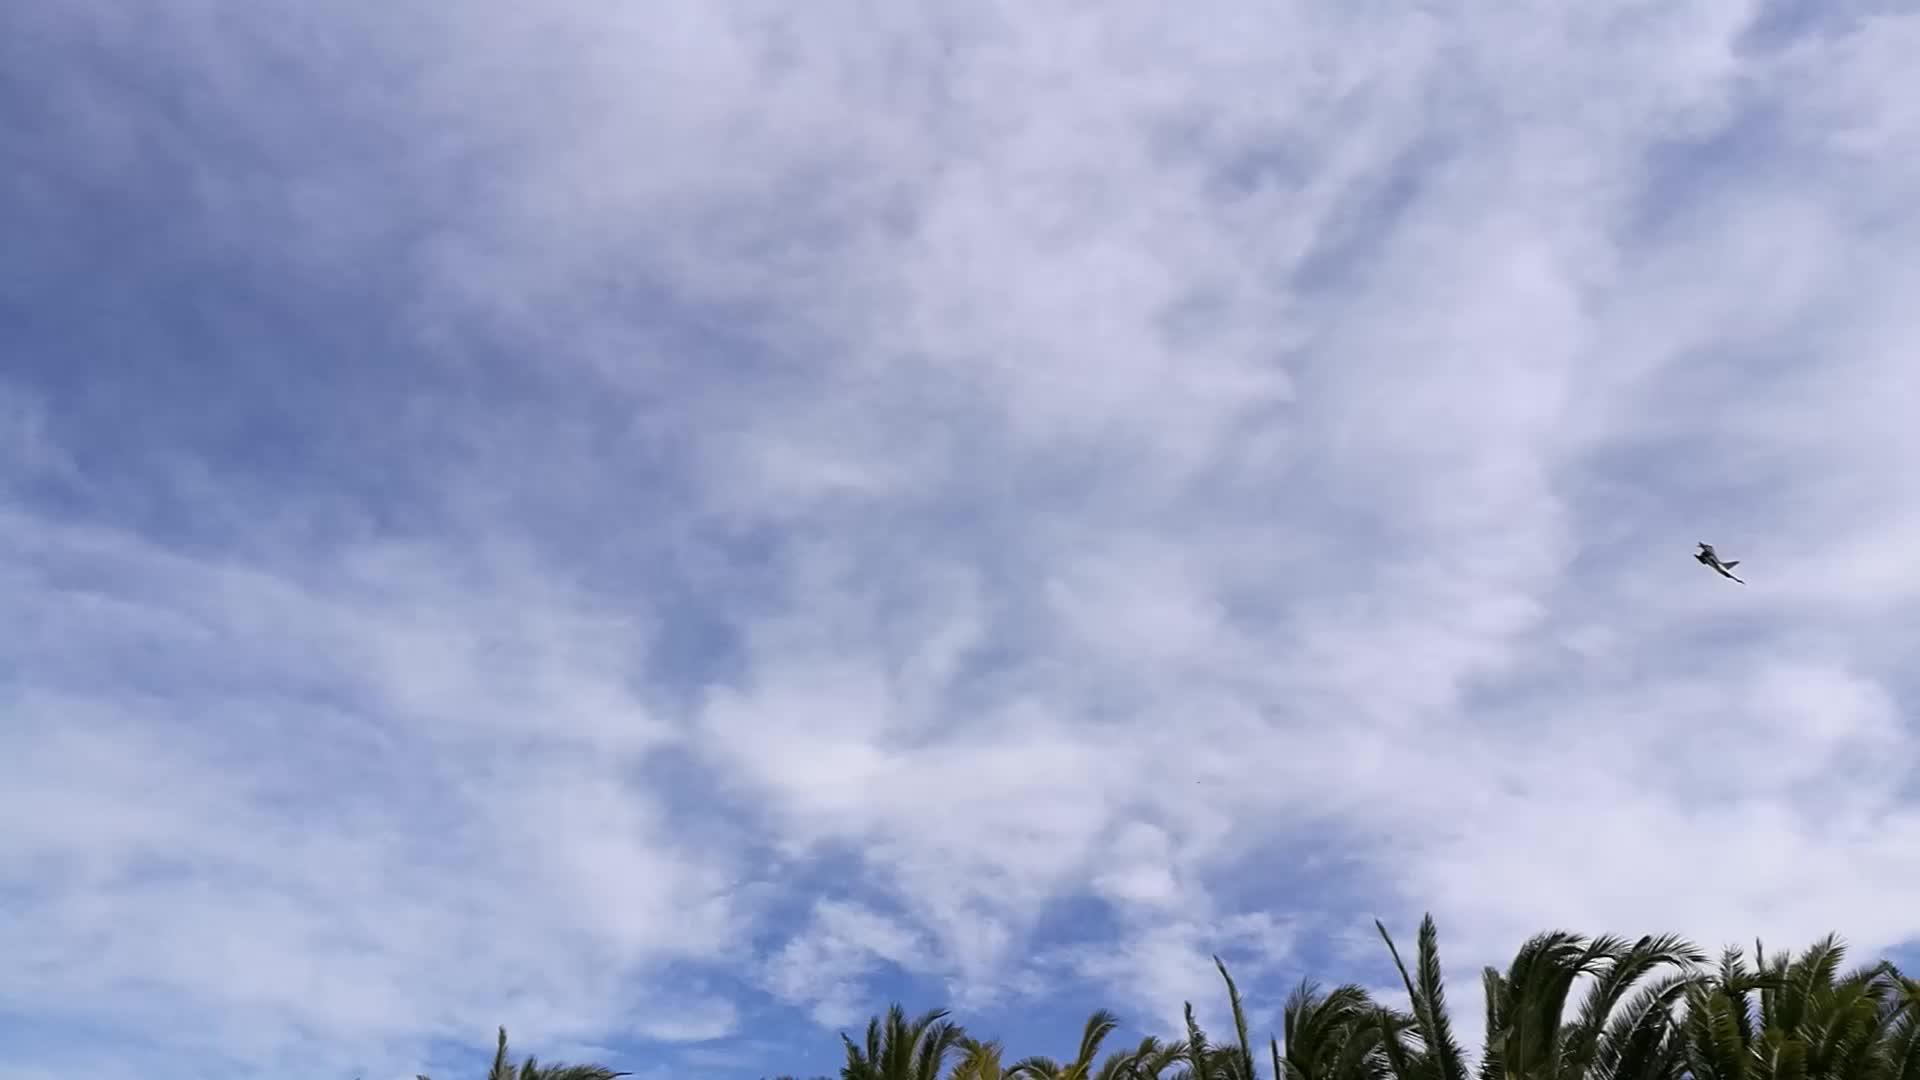 Dos cazas sobrevuelan el cielo de Ibiza